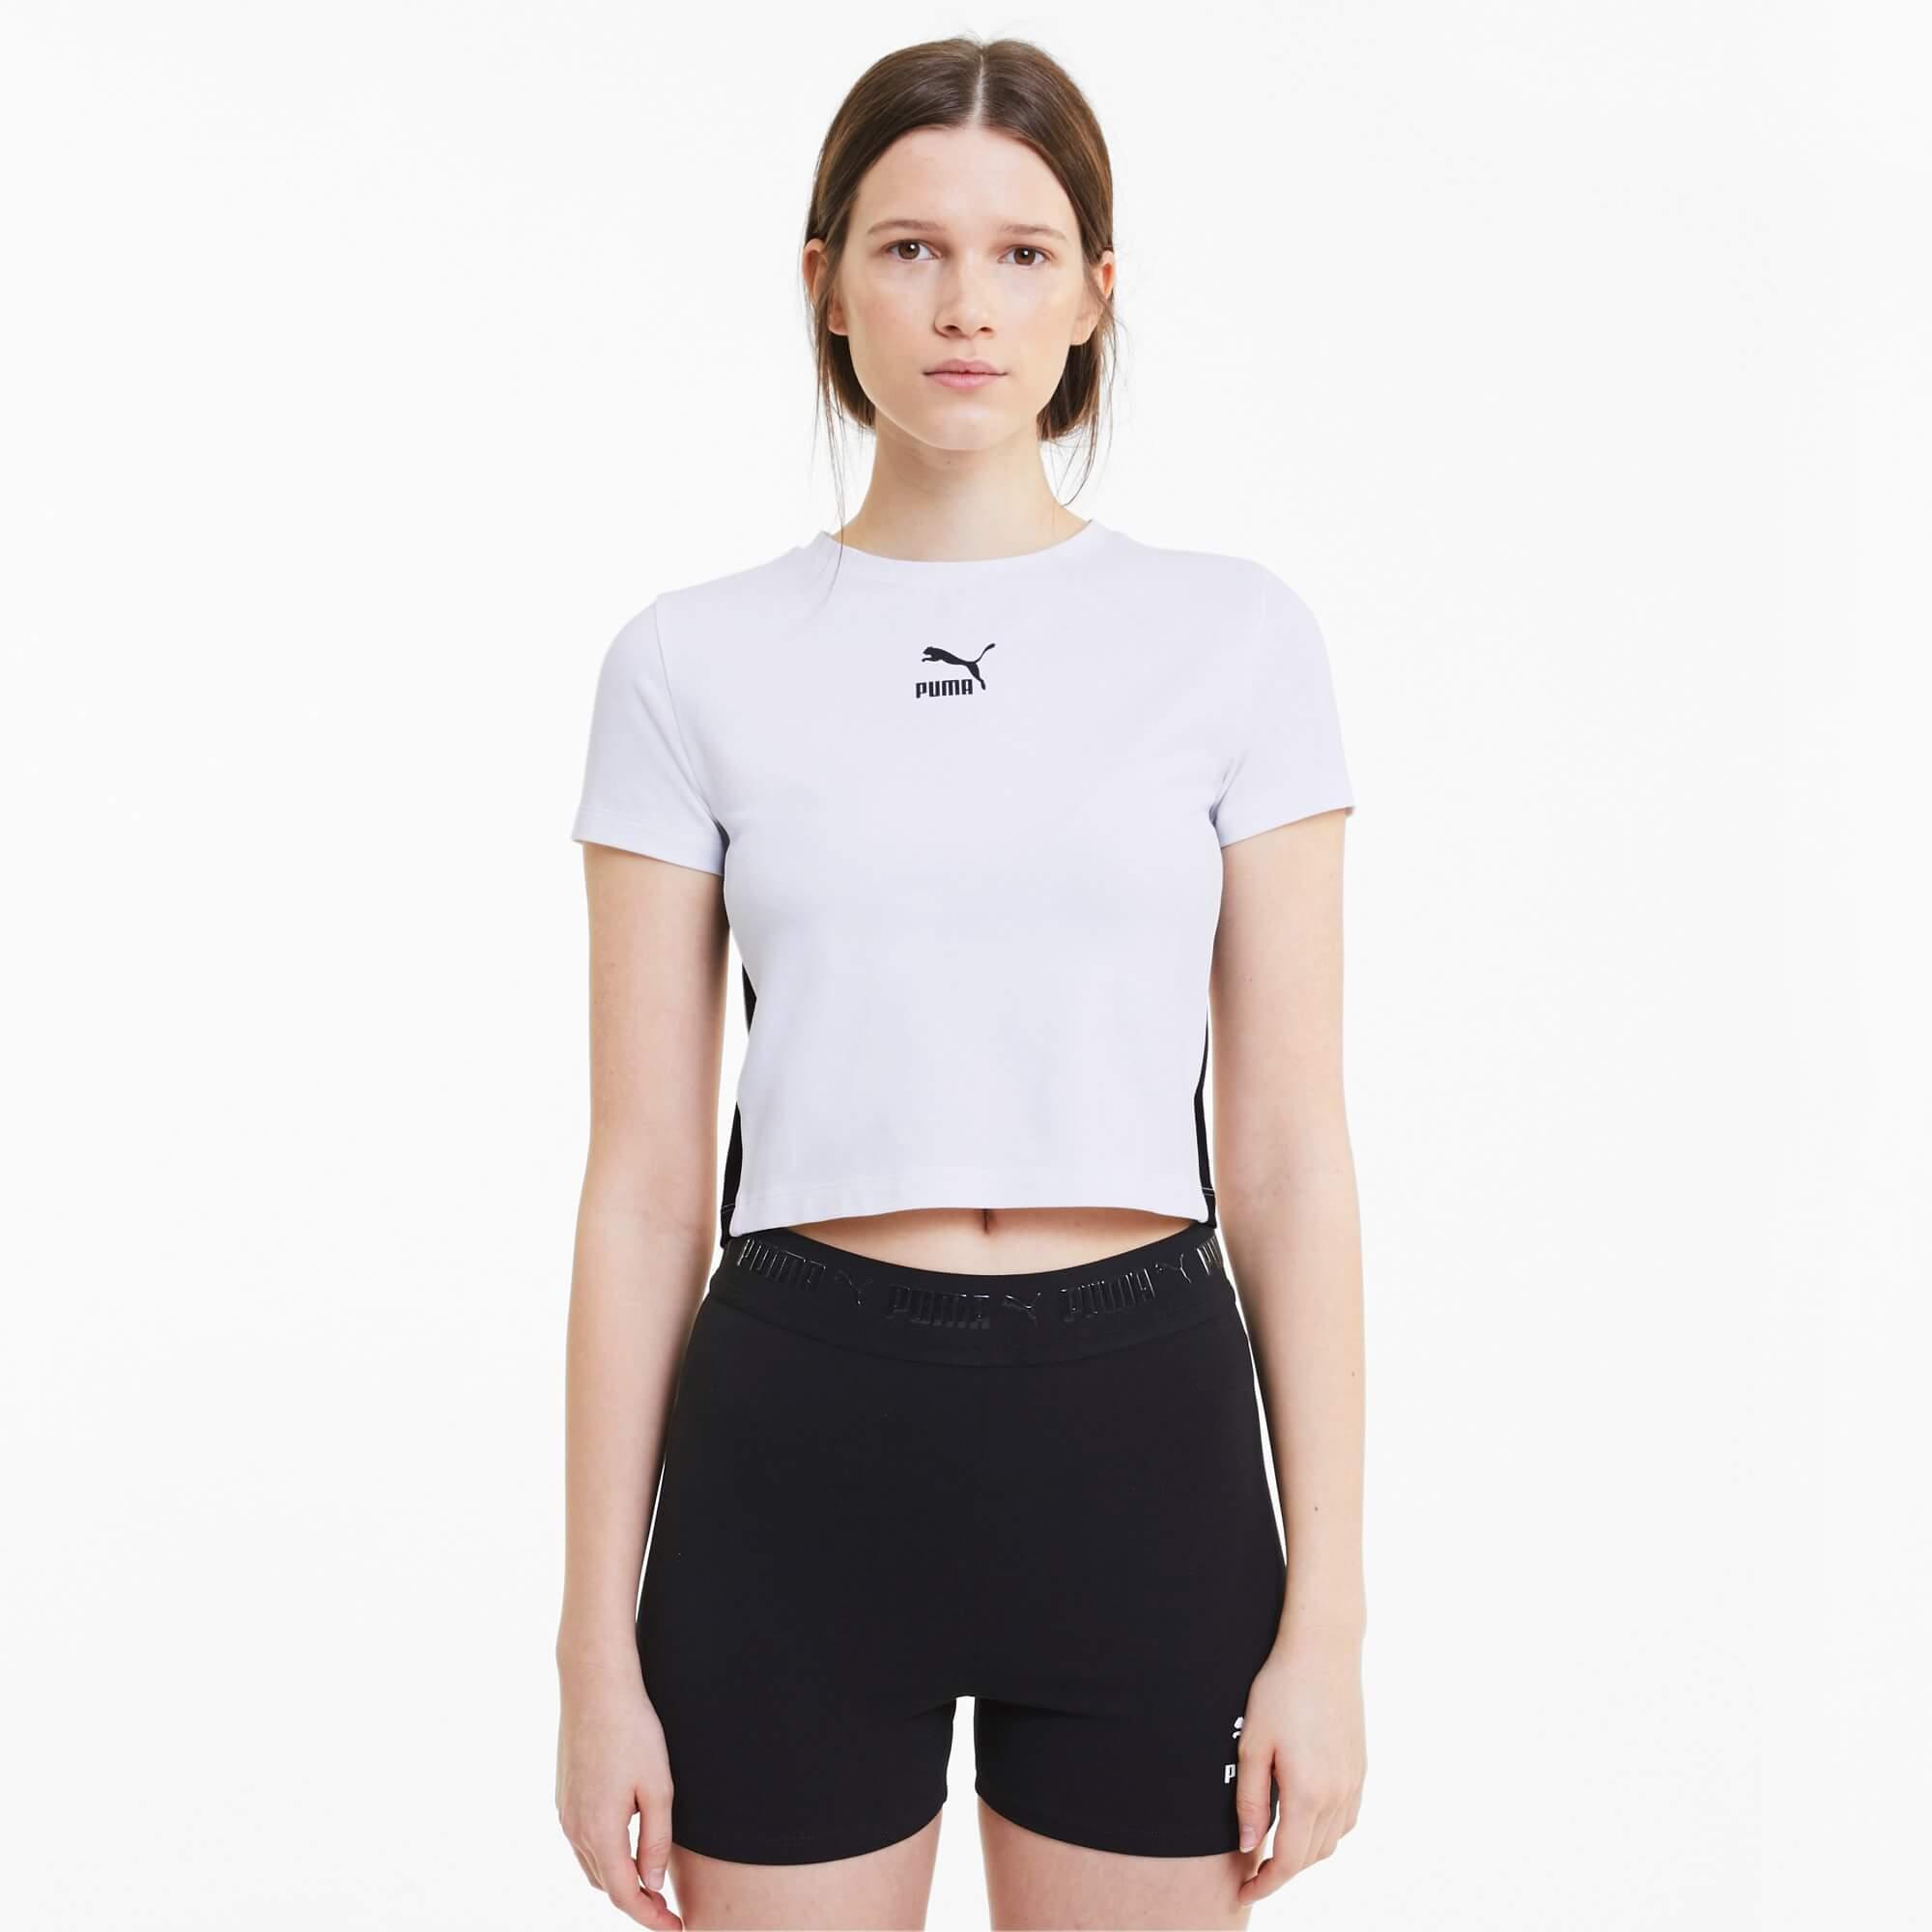 Vit crop top t-shirt